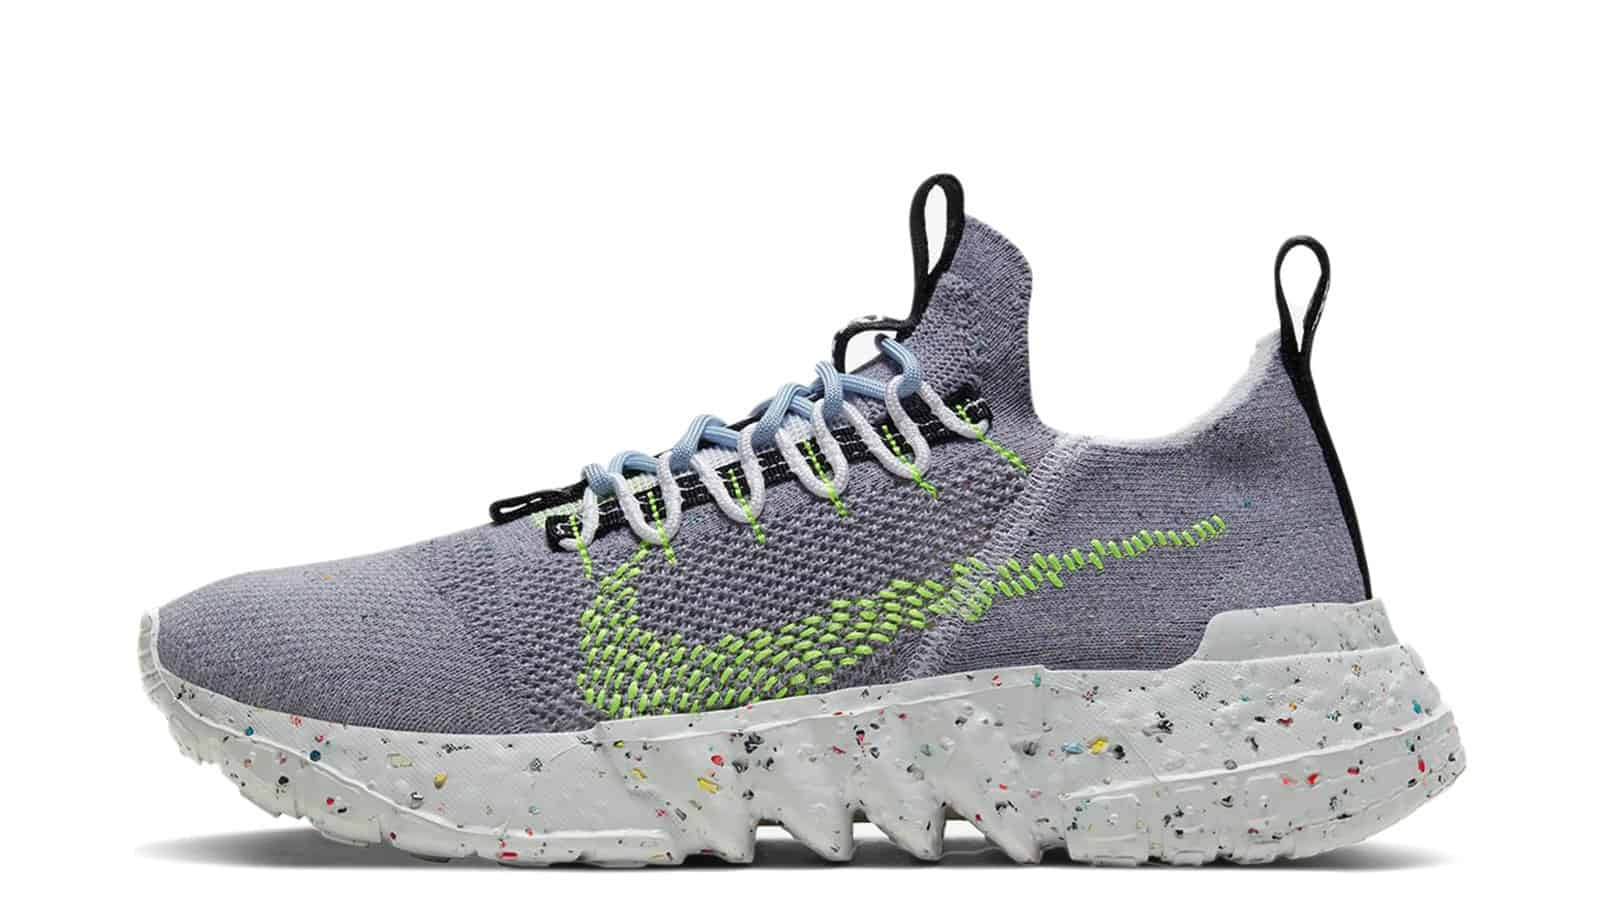 Nike Space Hippie 01 Volt This Is Trash CQ3986-002